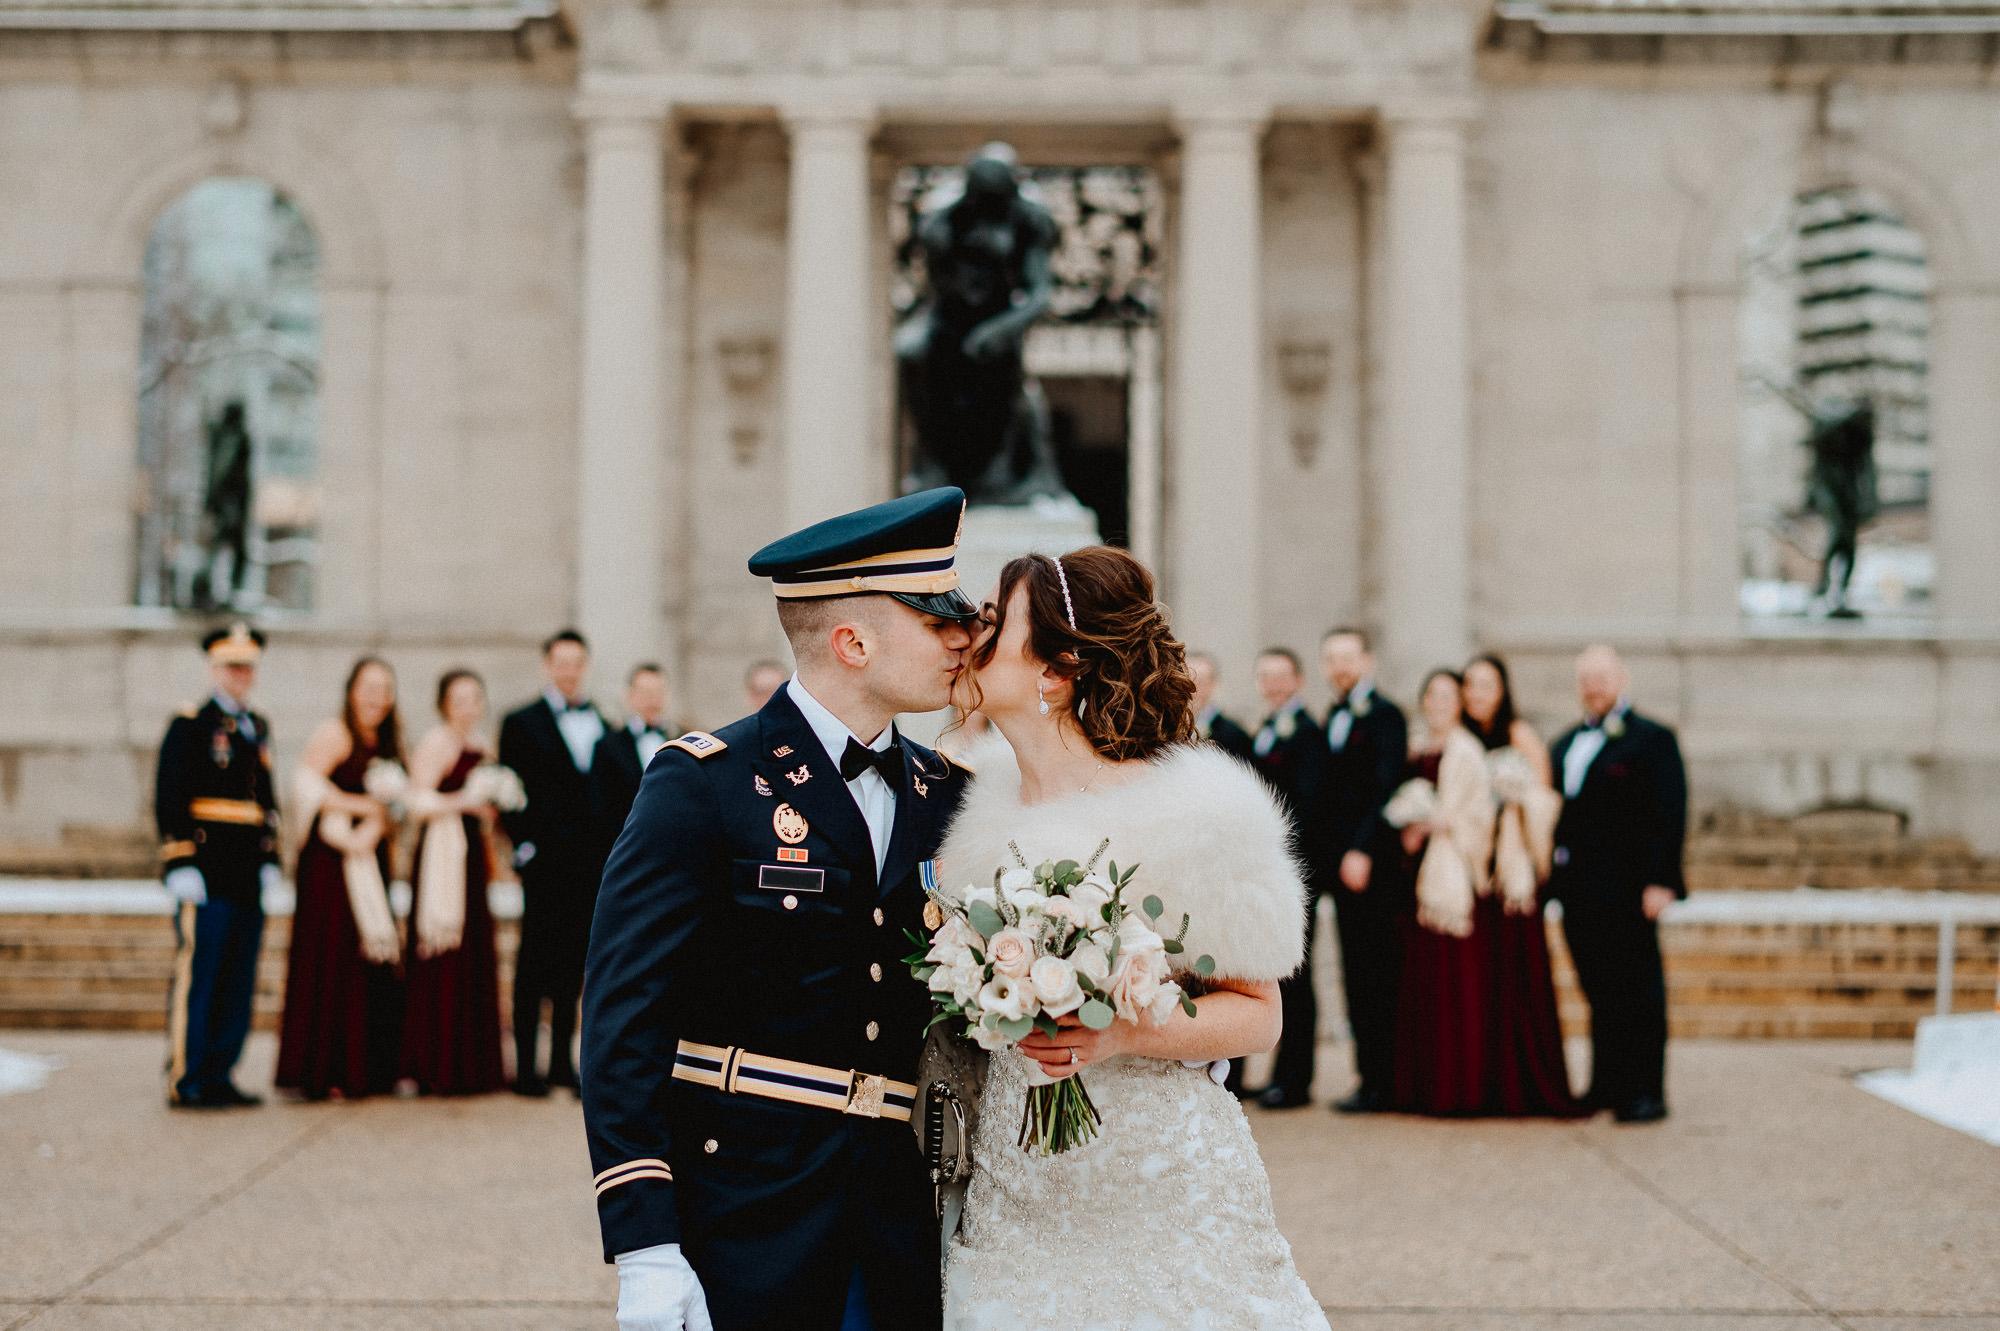 Uniform in wedding.jpg